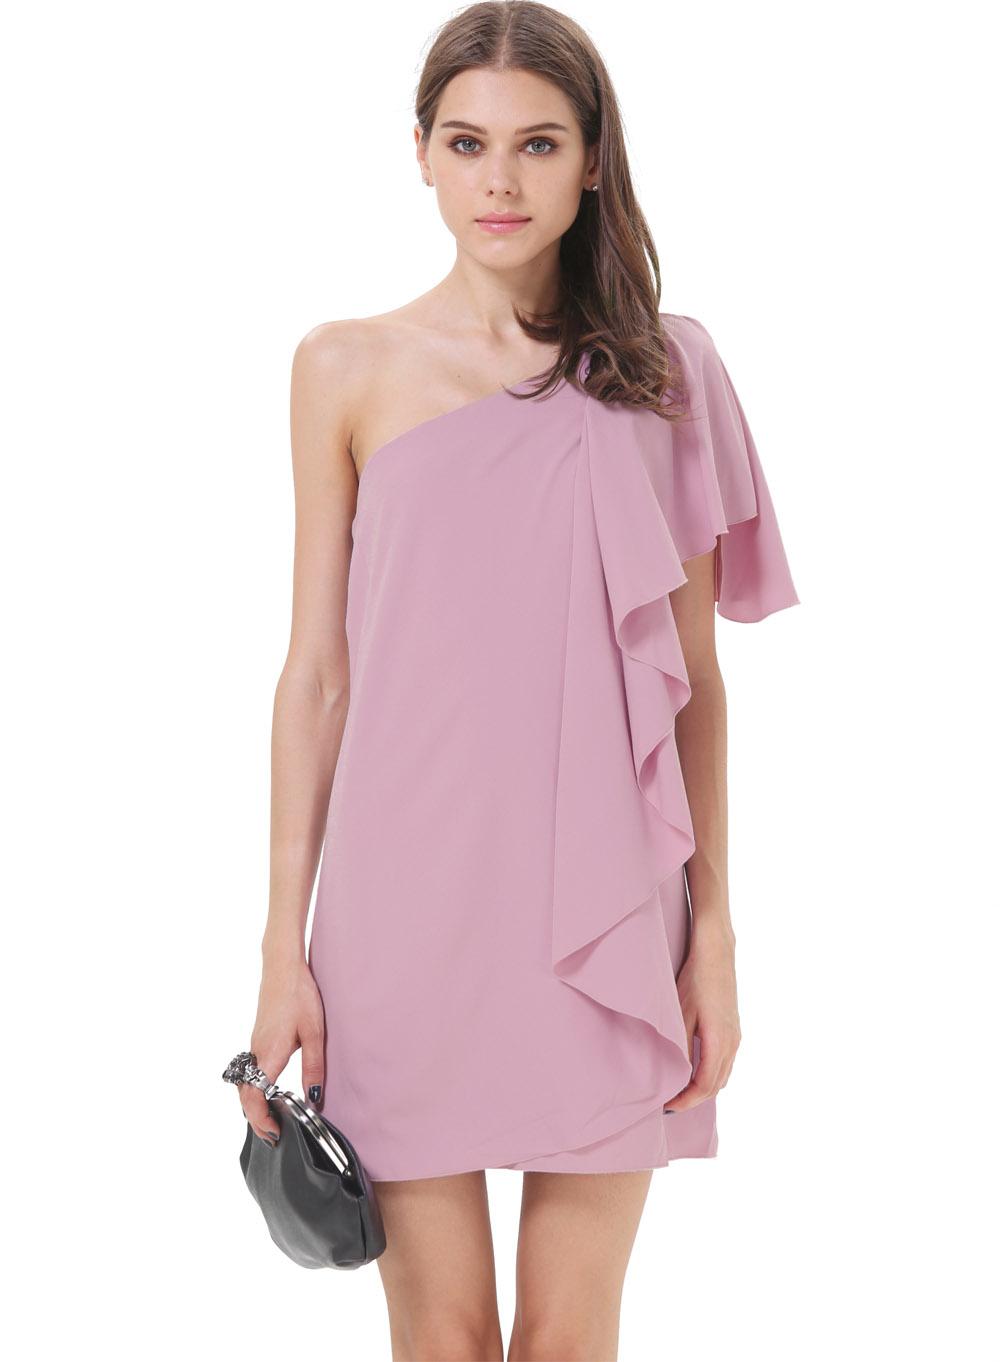 Vestido asimétrico volante hombro solo-violeta